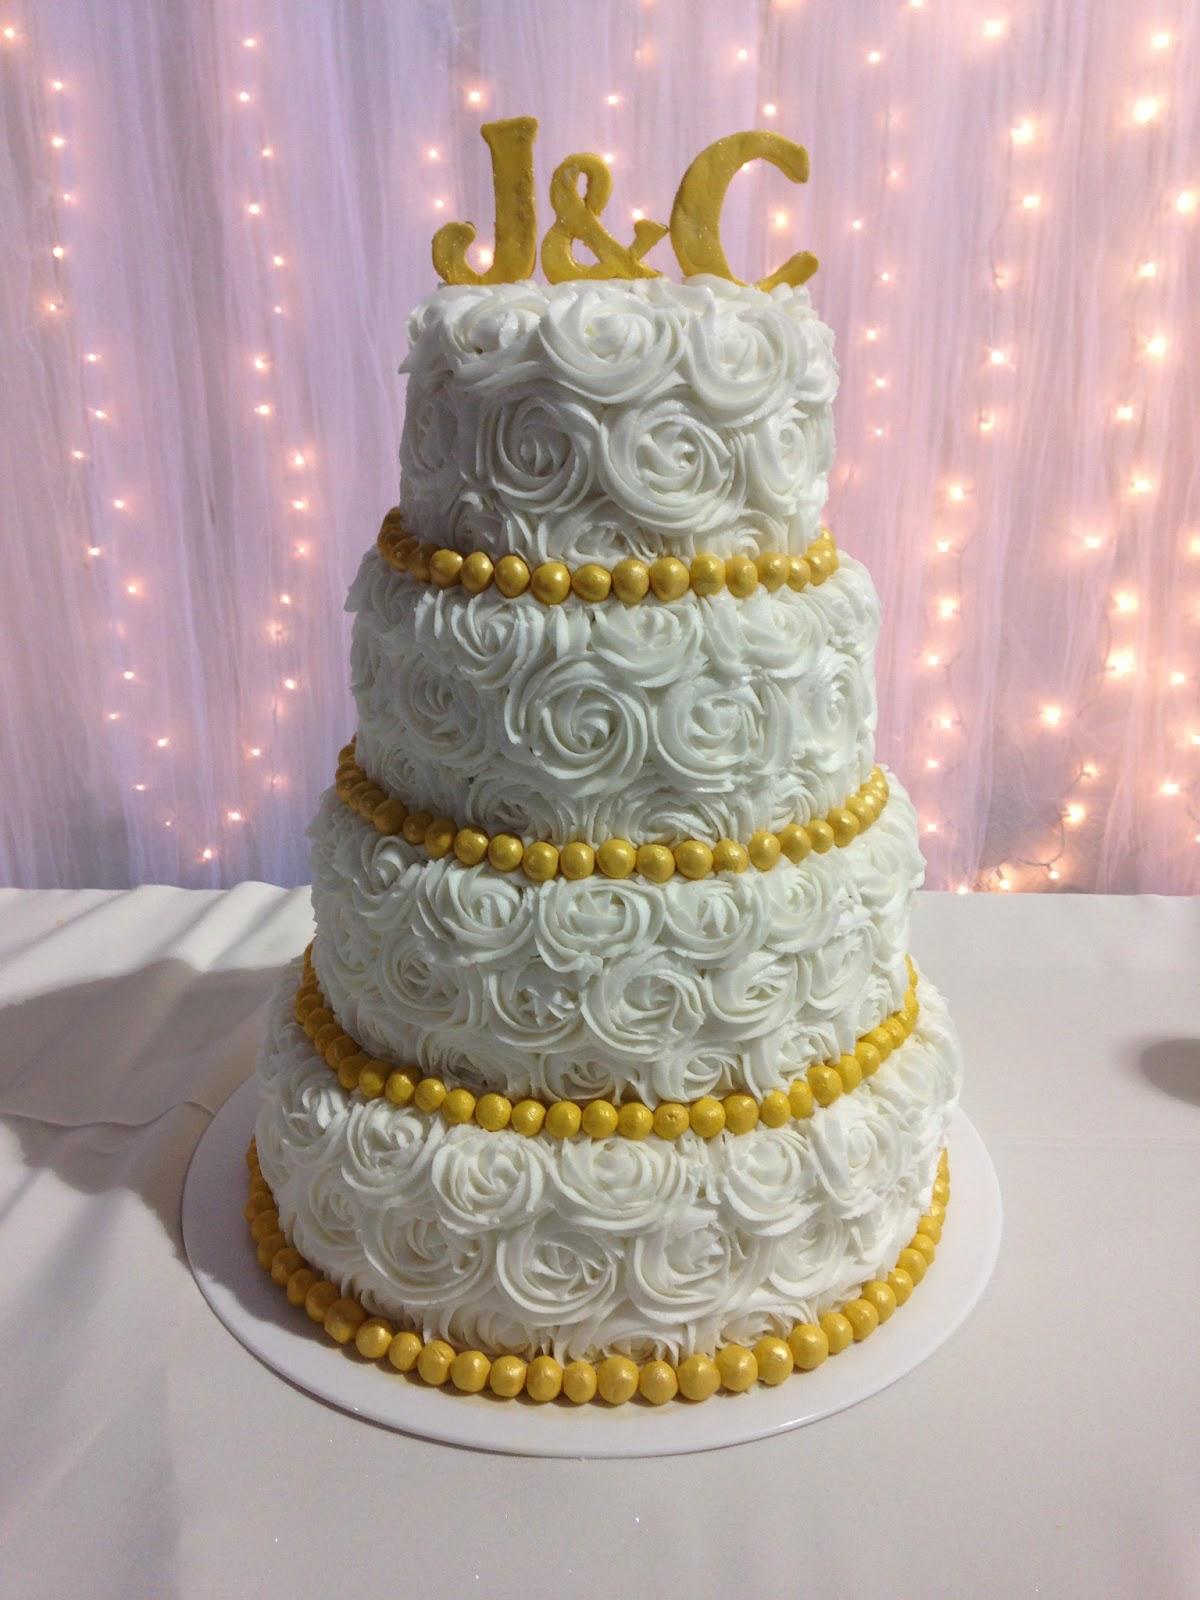 Sarah Jones Cakes Wedding & Grooms Cakes from May 2013